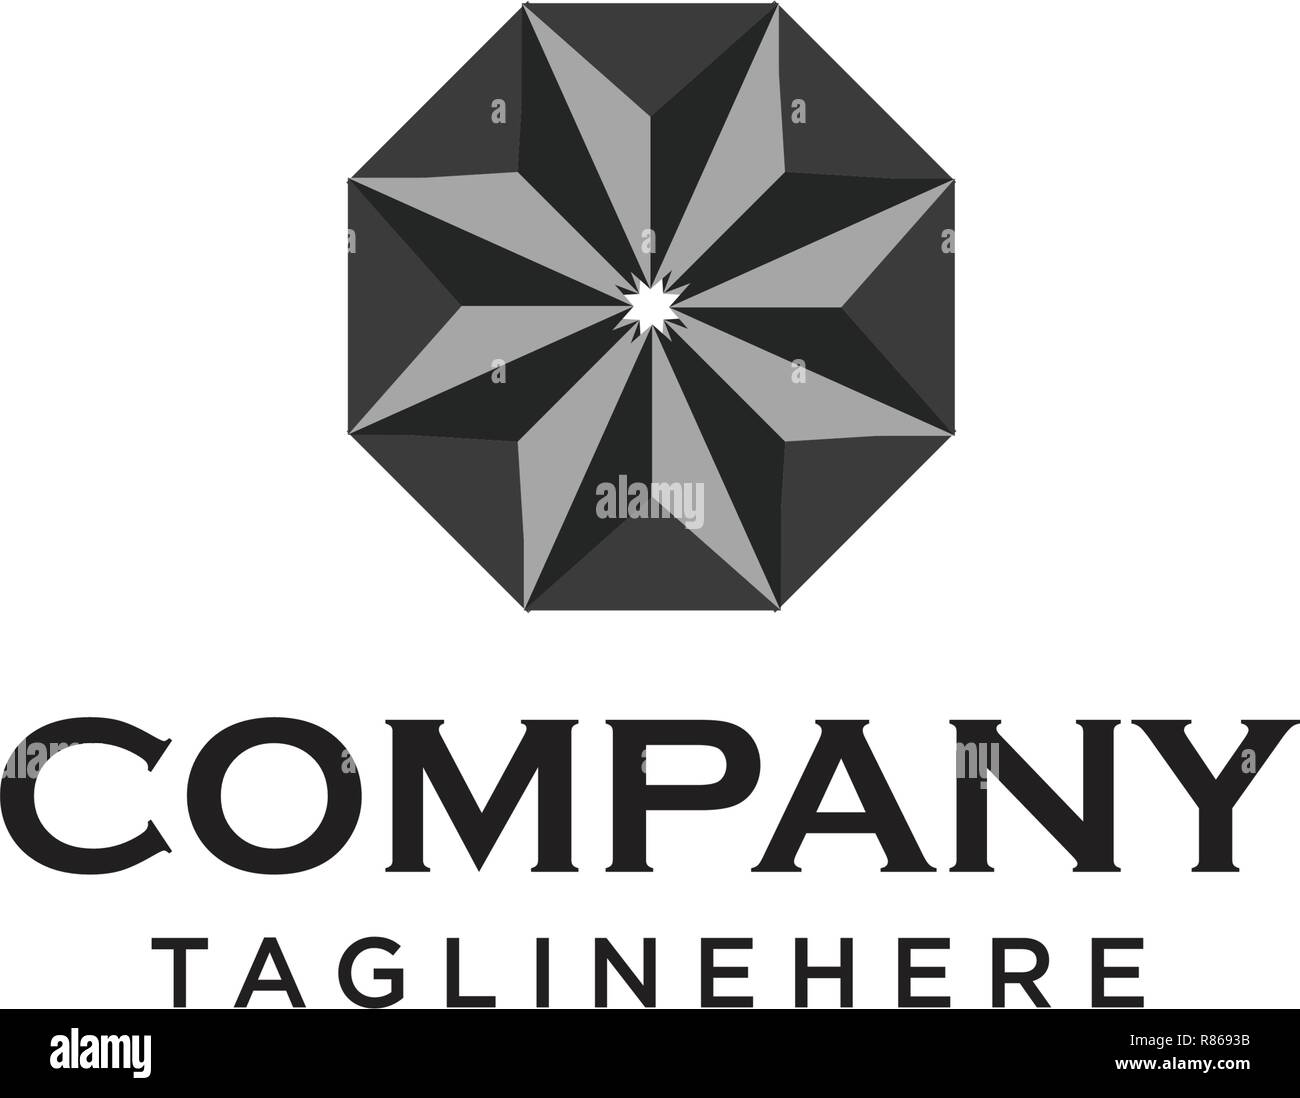 diamond logo design template - Stock Image